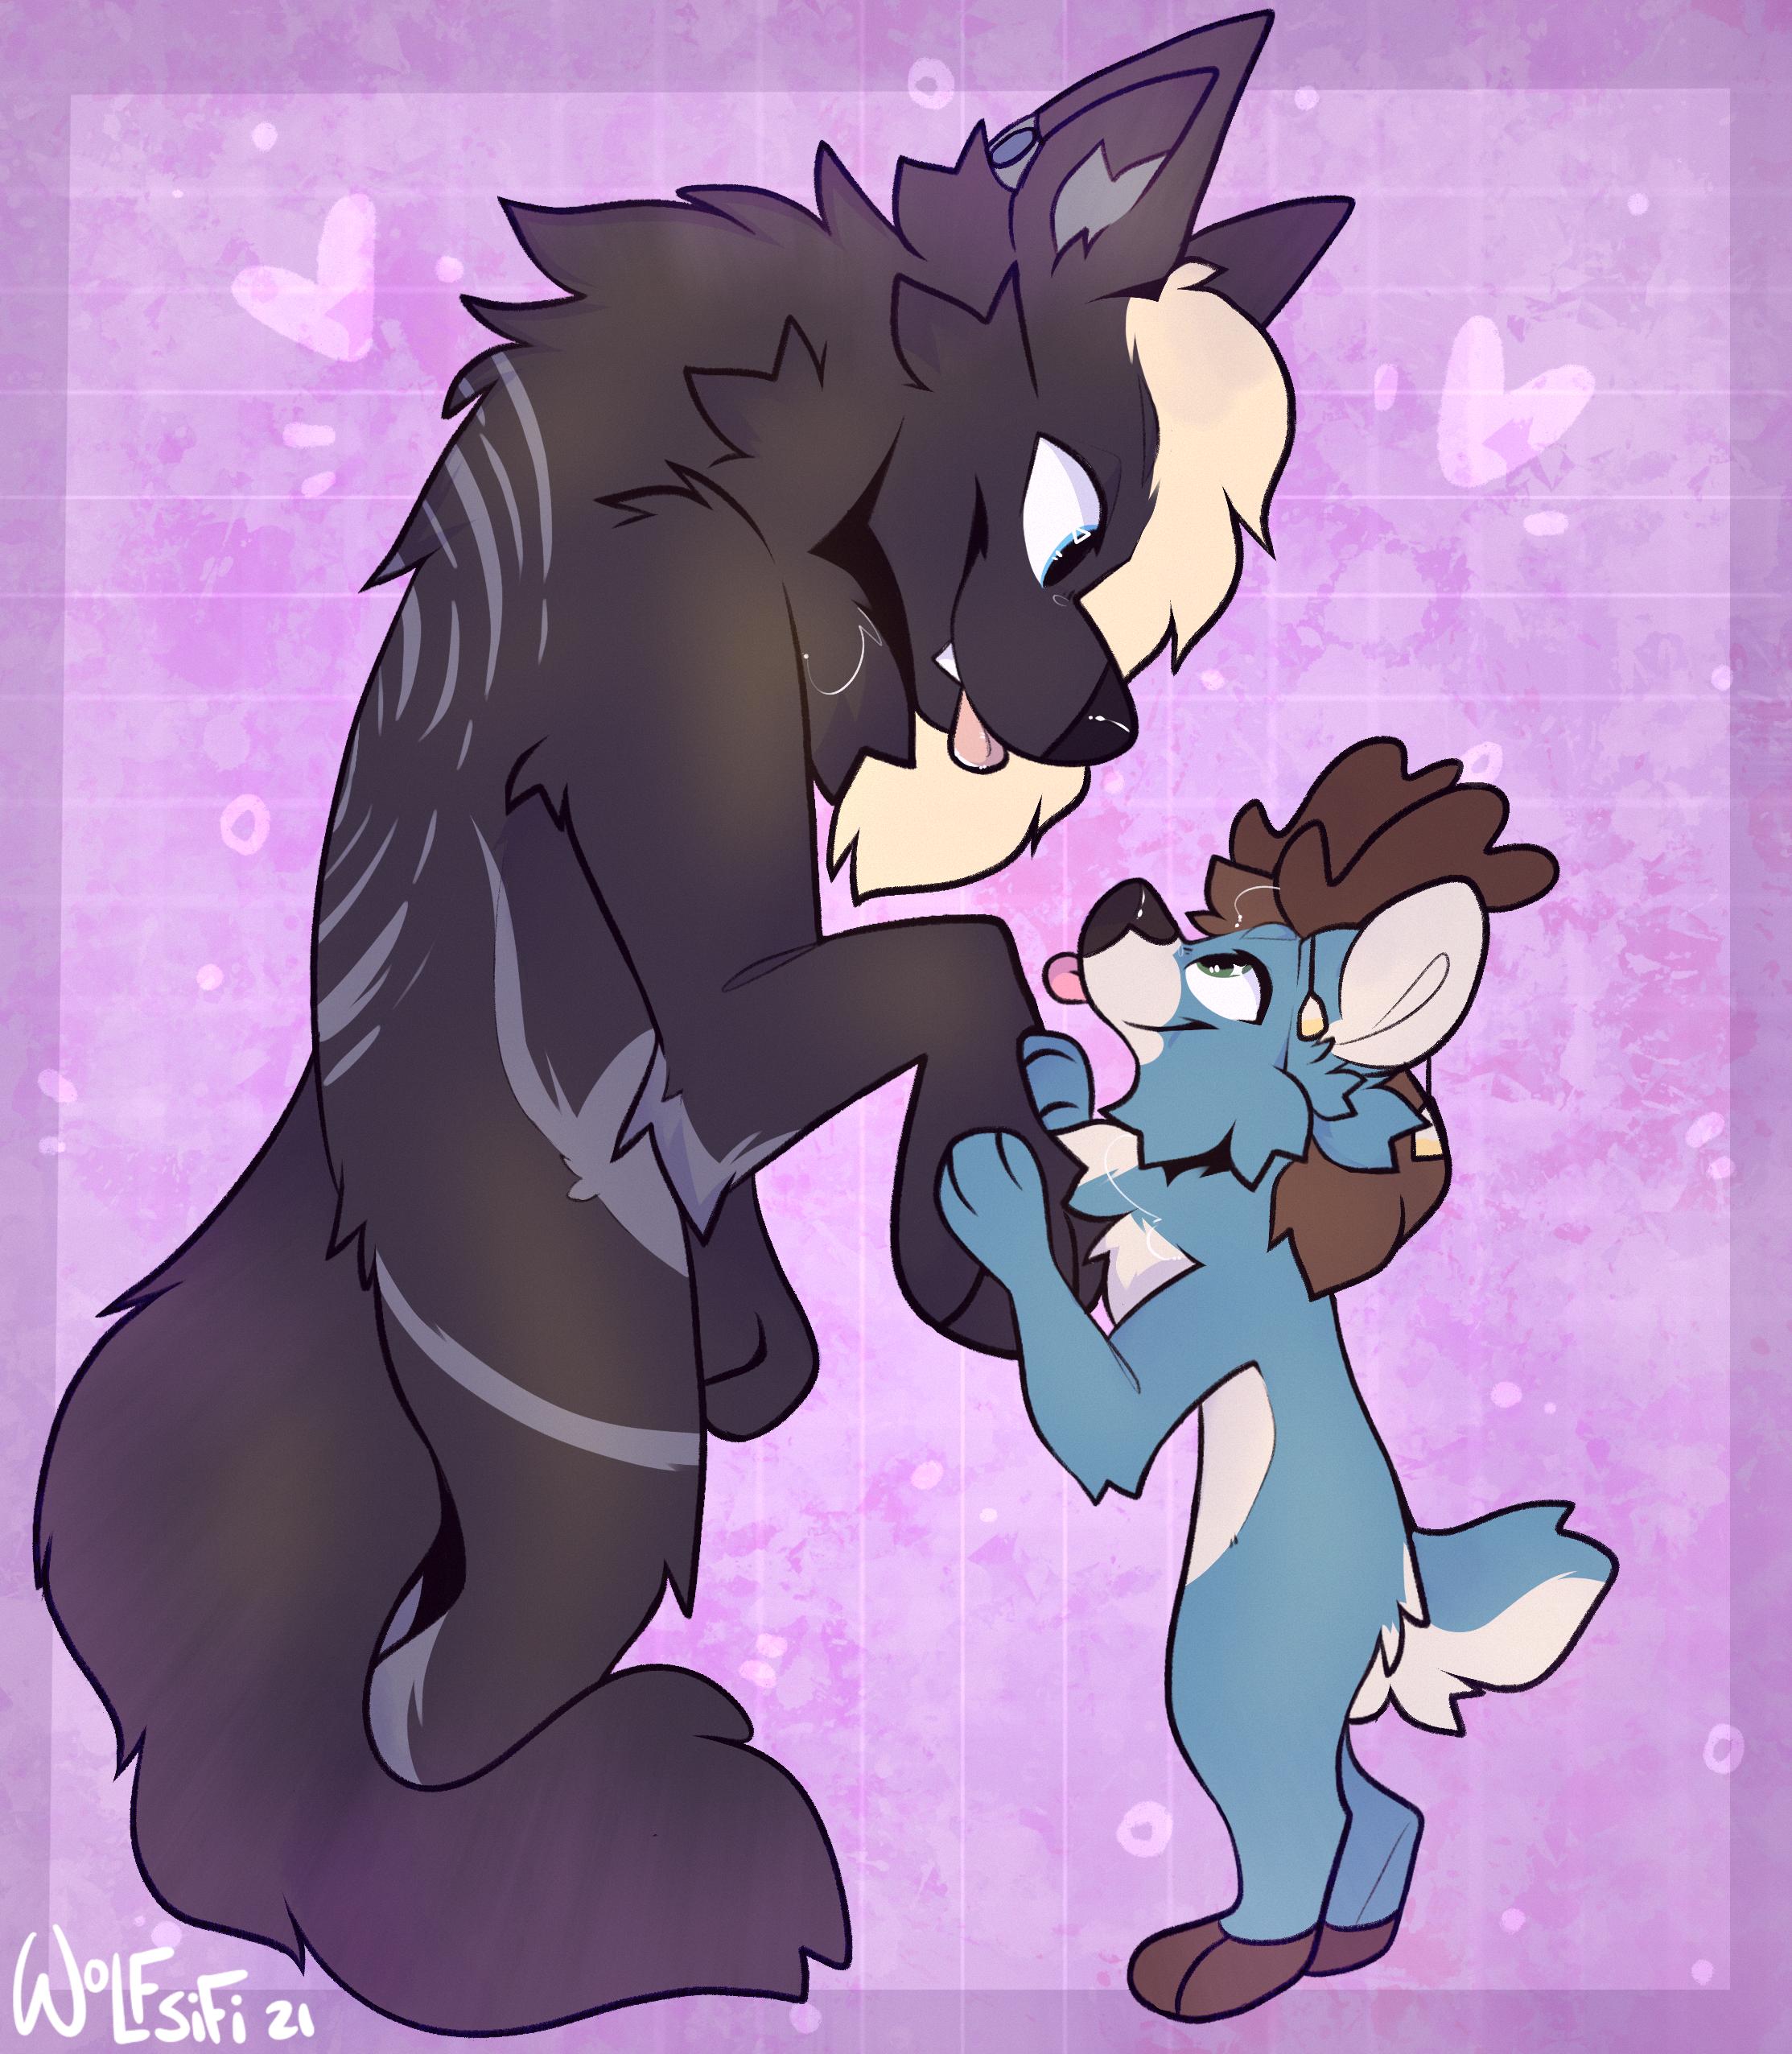 The Big Black Wolf  the Smol Blue Deer ~ wolfsifi